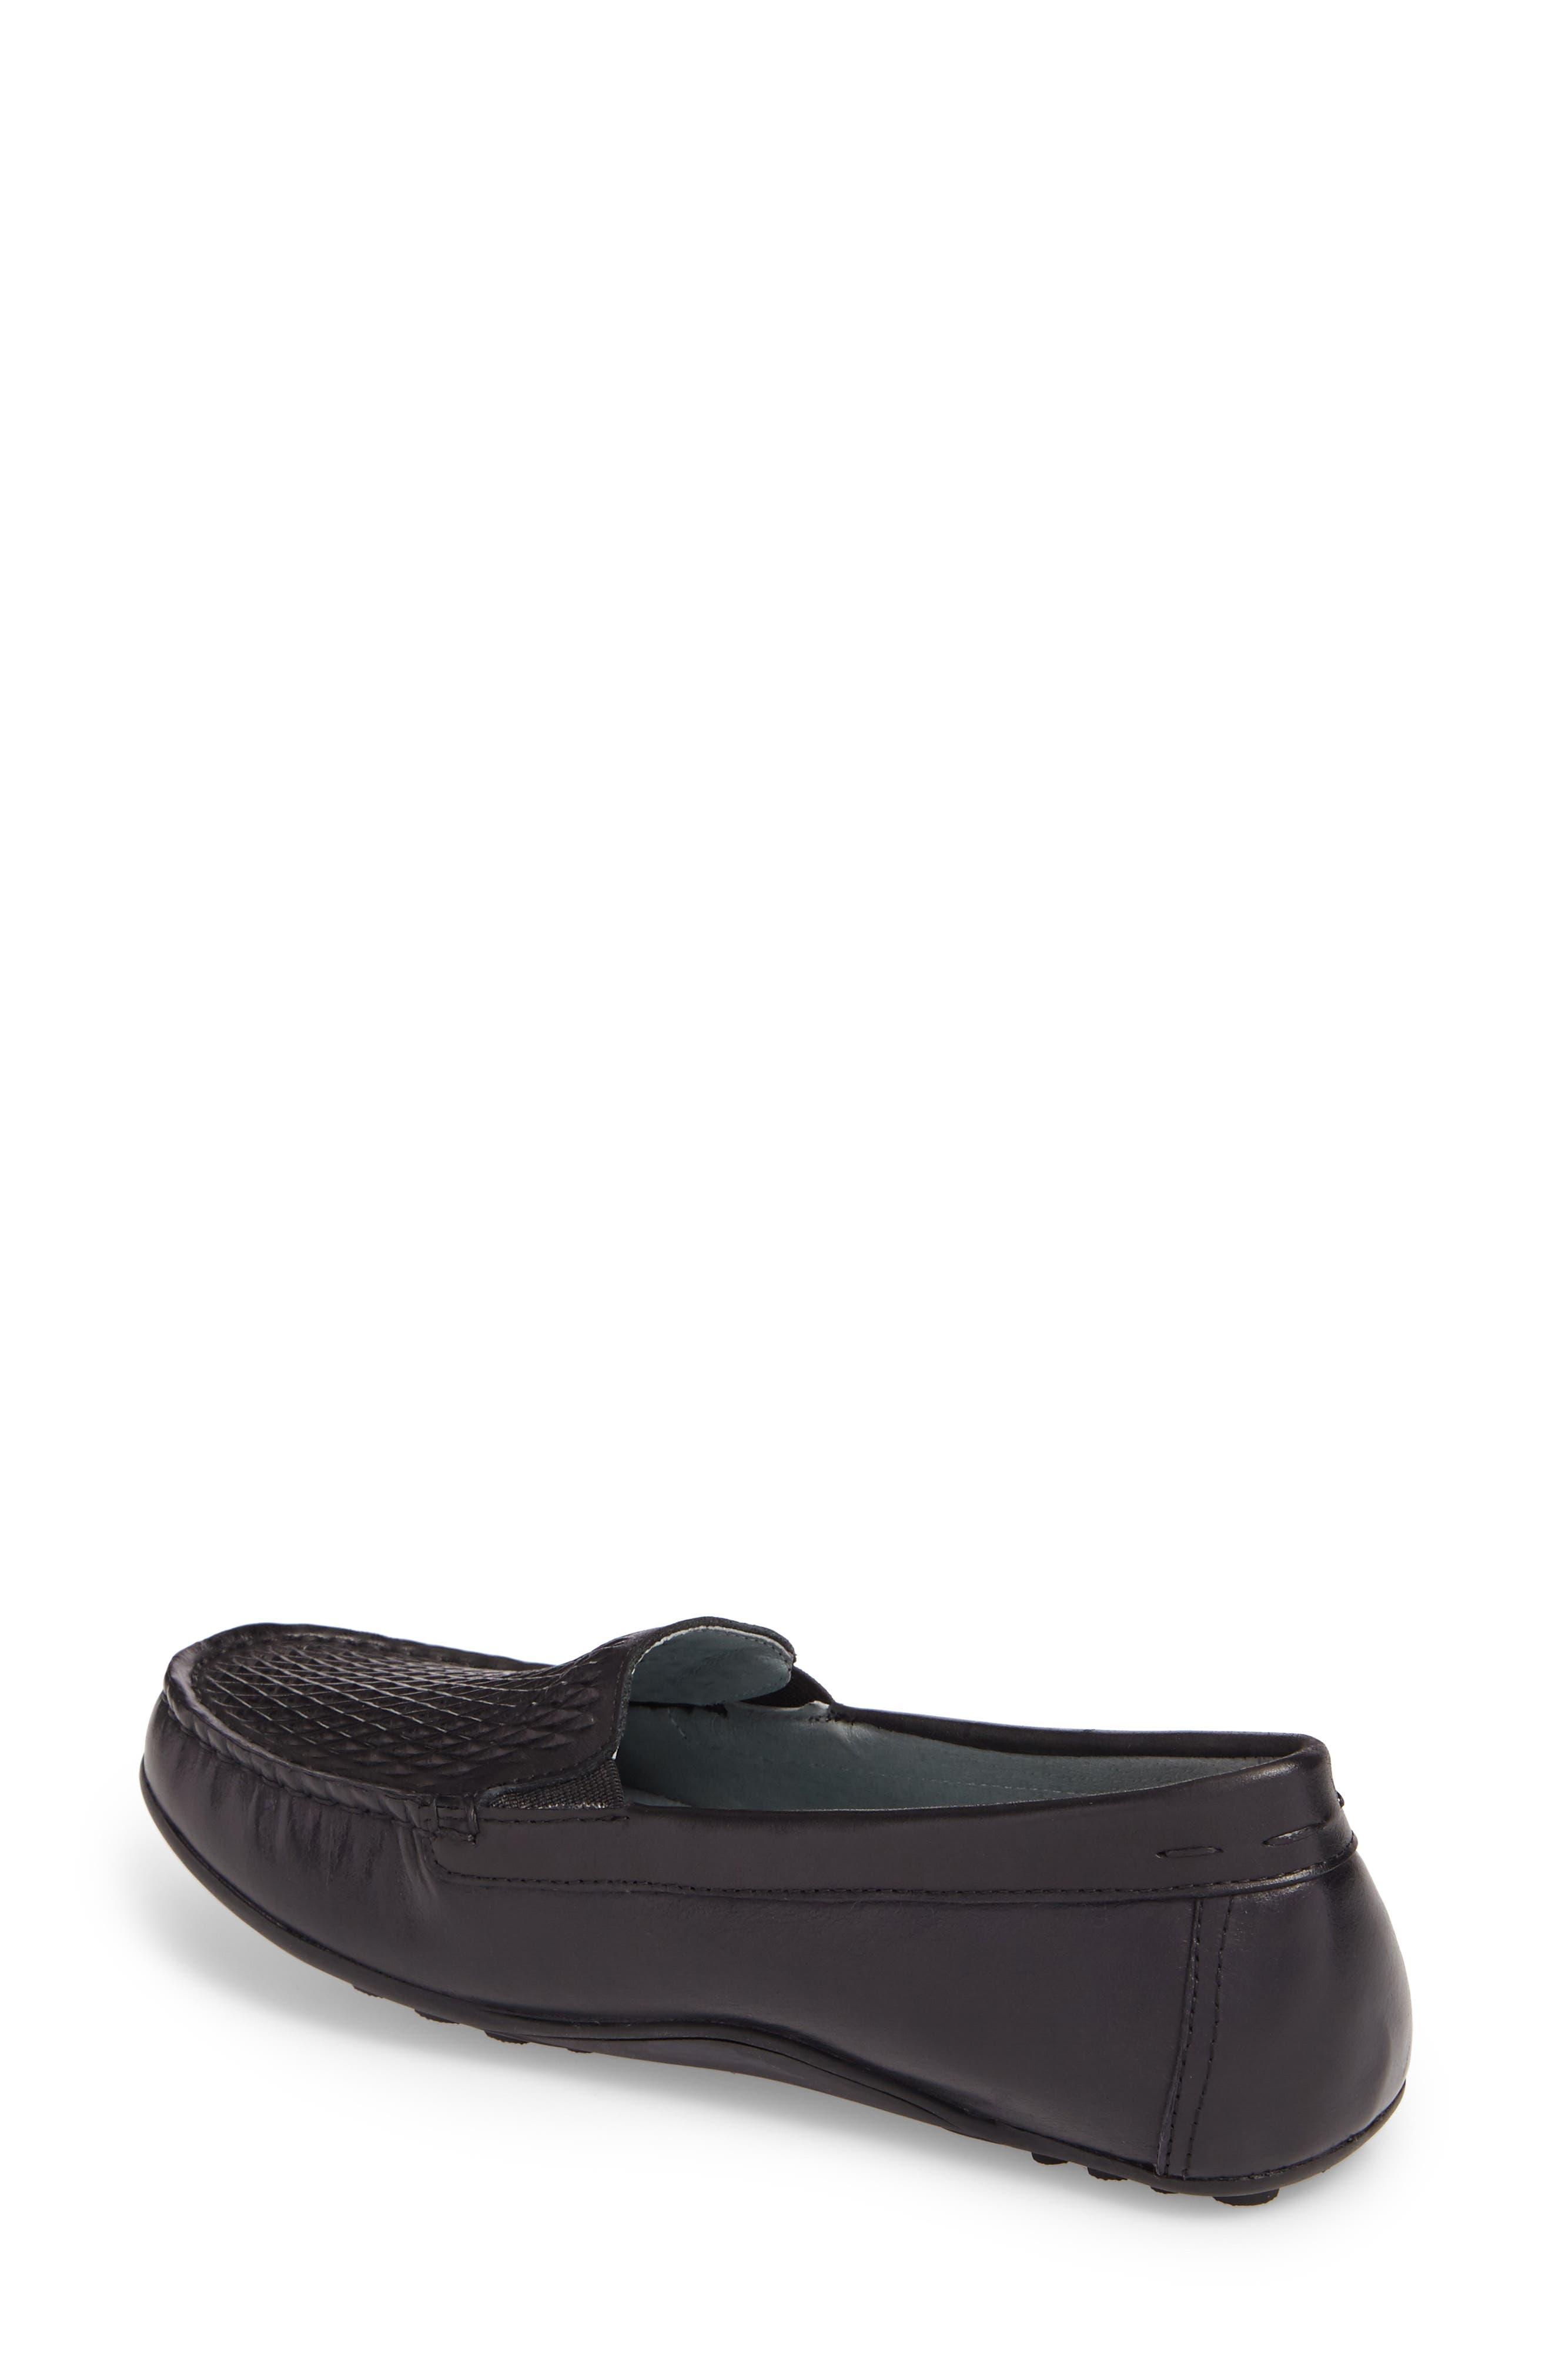 Posh Driving Loafer,                             Alternate thumbnail 2, color,                             BLACK LEATHER